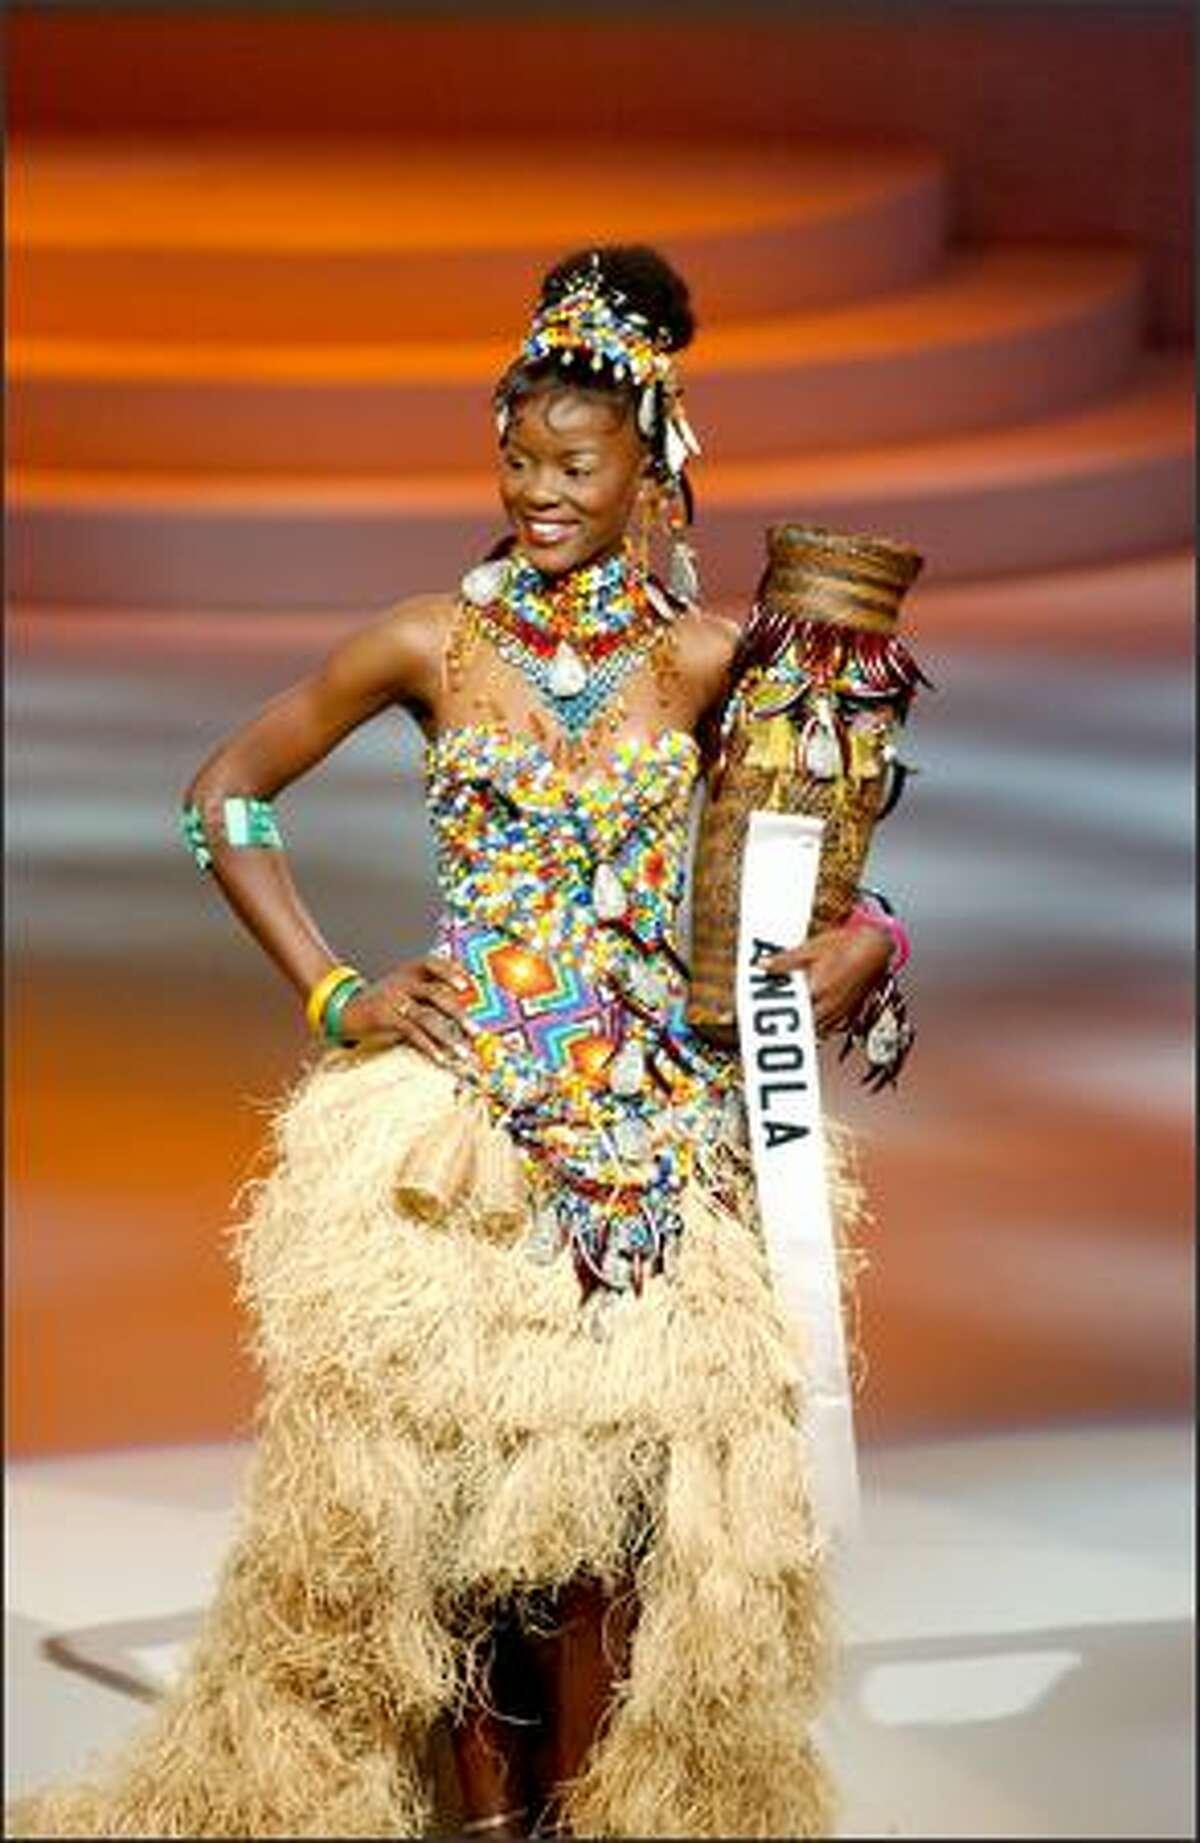 Telma de Jesus Esperanca Sonhi, Miss Angola, participates in the 2004 Miss Universe National Costume Show at the Casa de la Cultura in Quito, Ecuador.